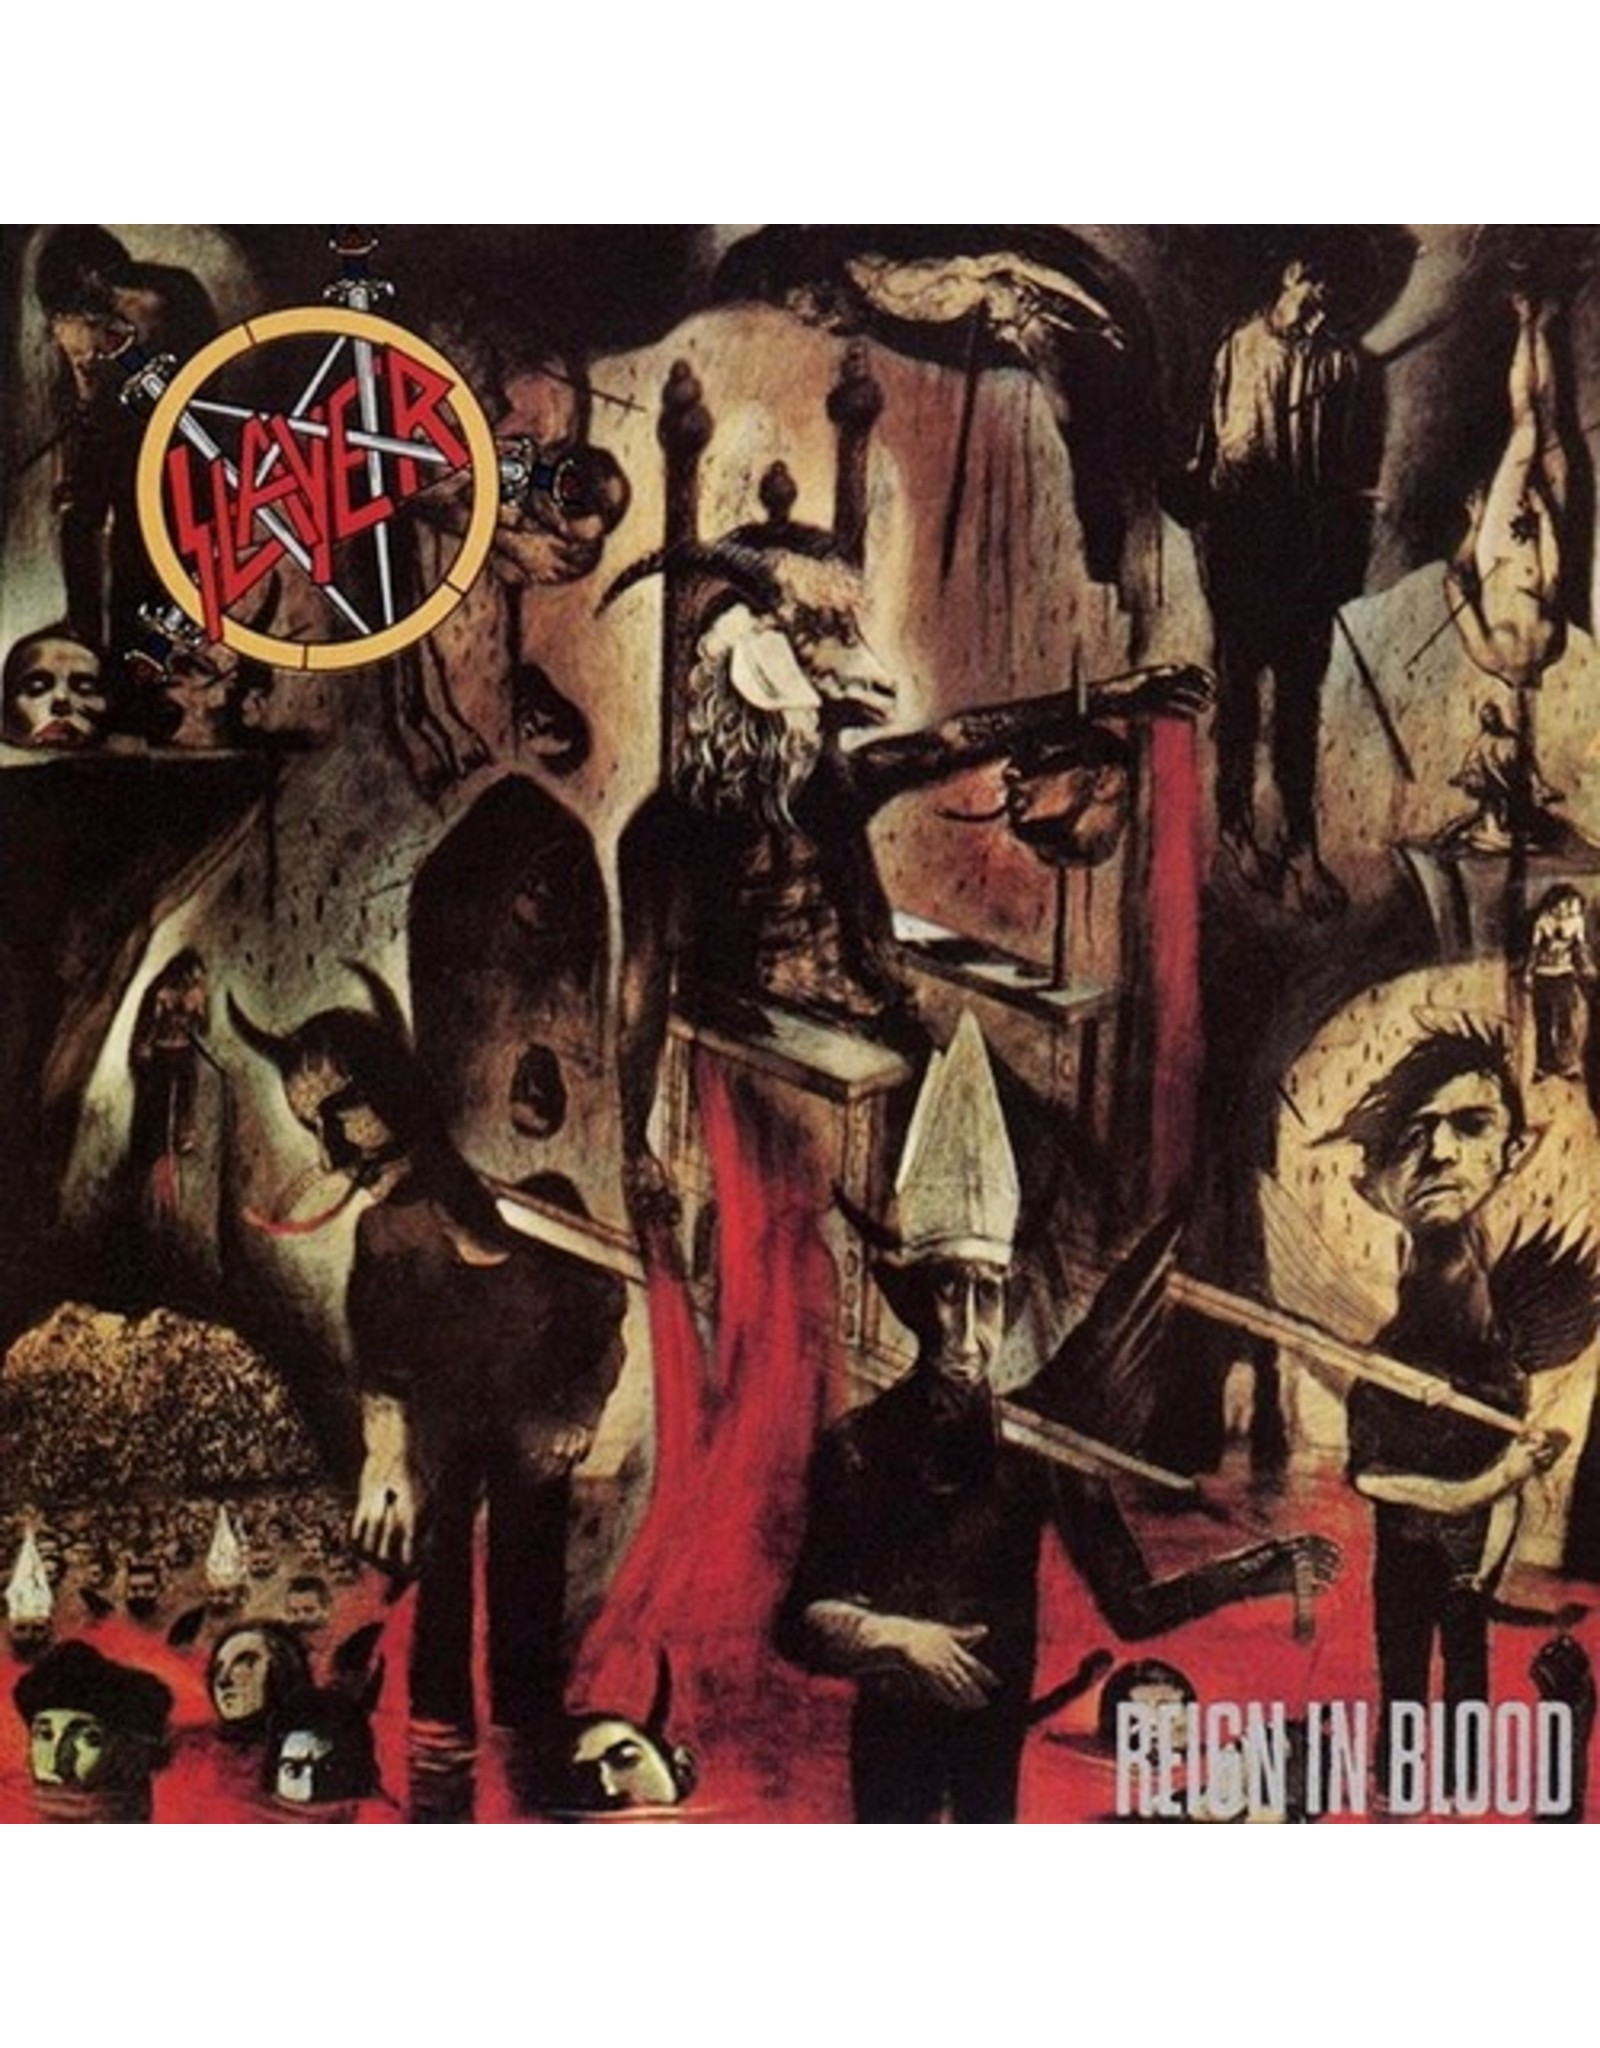 New Vinyl Slayer - Reign In Blood LP